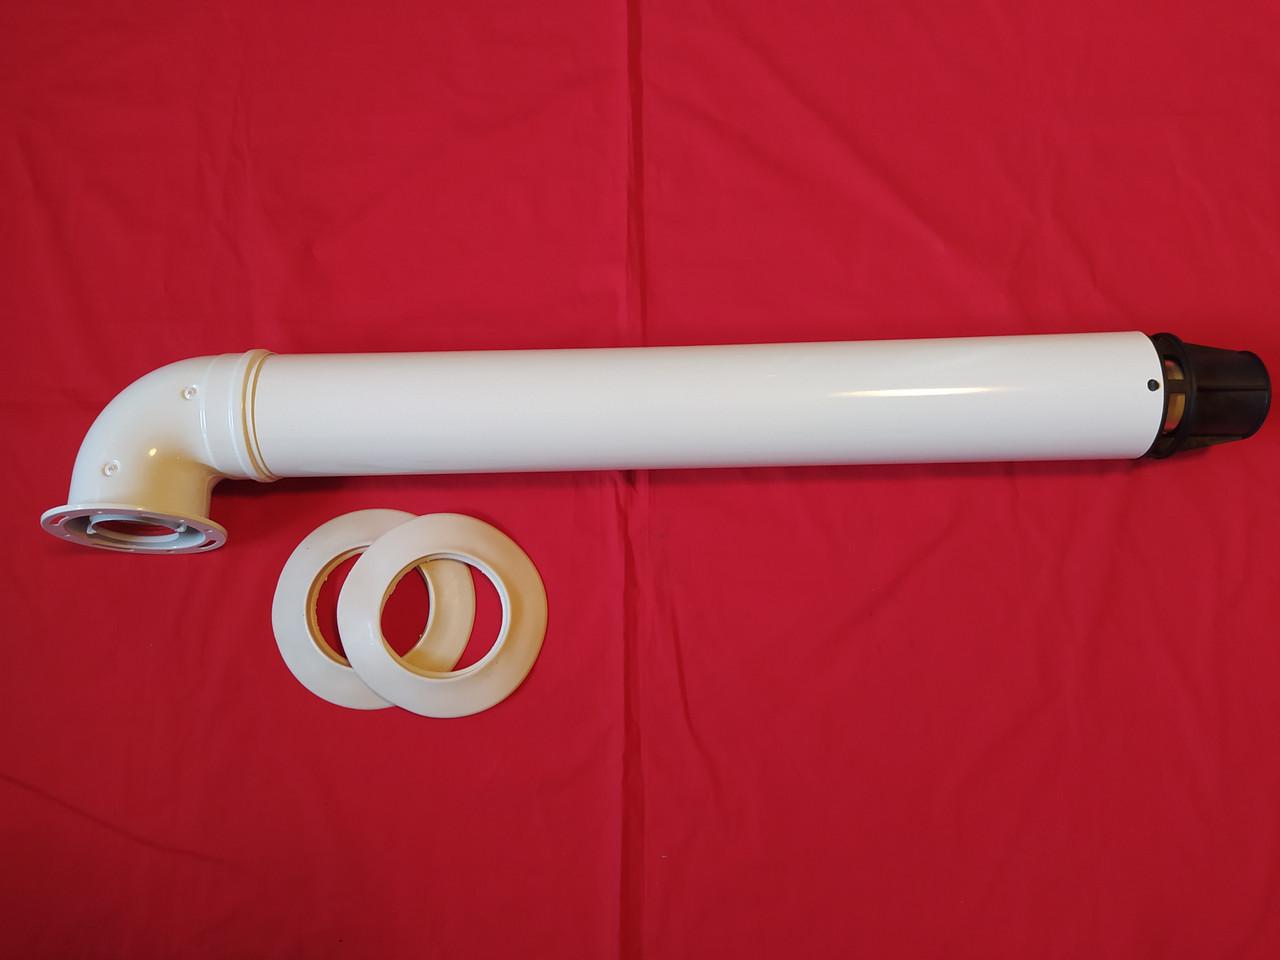 Коаксиальный дымоход 60/100 для котла Fondital Italtherm Protherm Рысь Ягуар